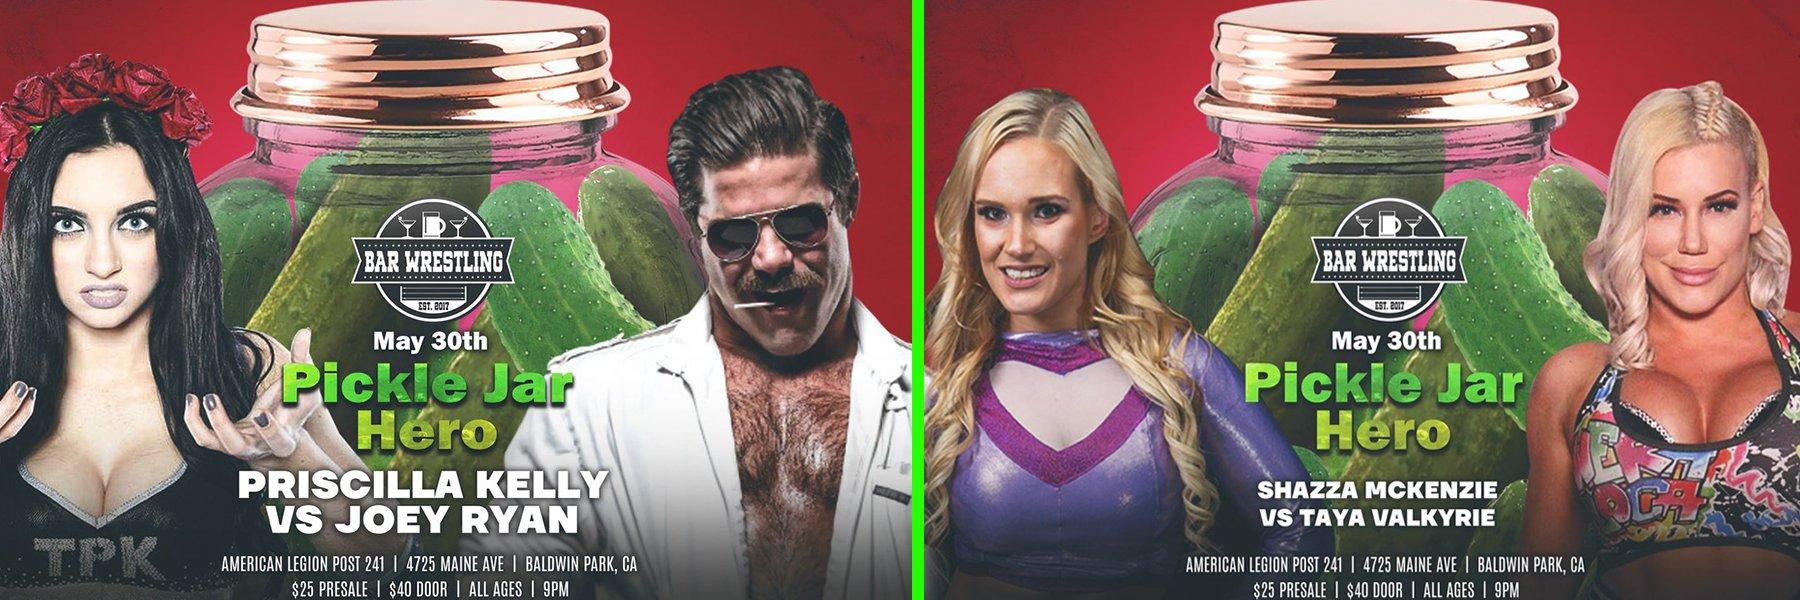 Bar Wrestling 36! Joey Ryan vs Priscilla Kelly, Taya Valkyrie vs Shazza